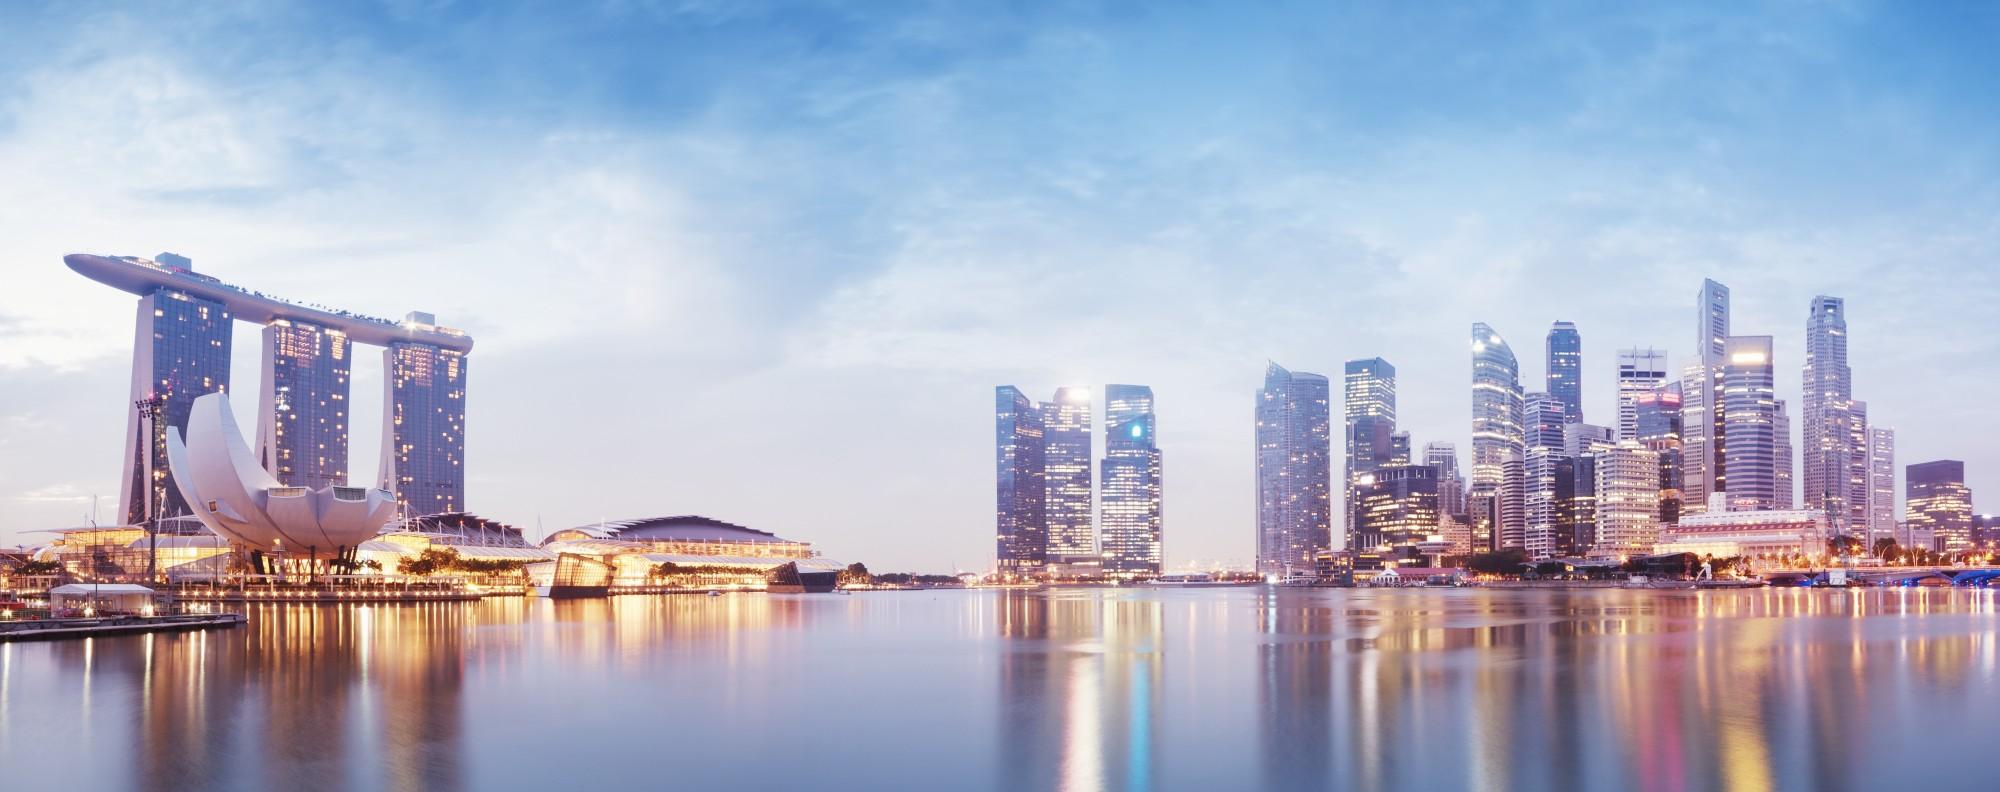 The Singapore skyline. Handout Photo